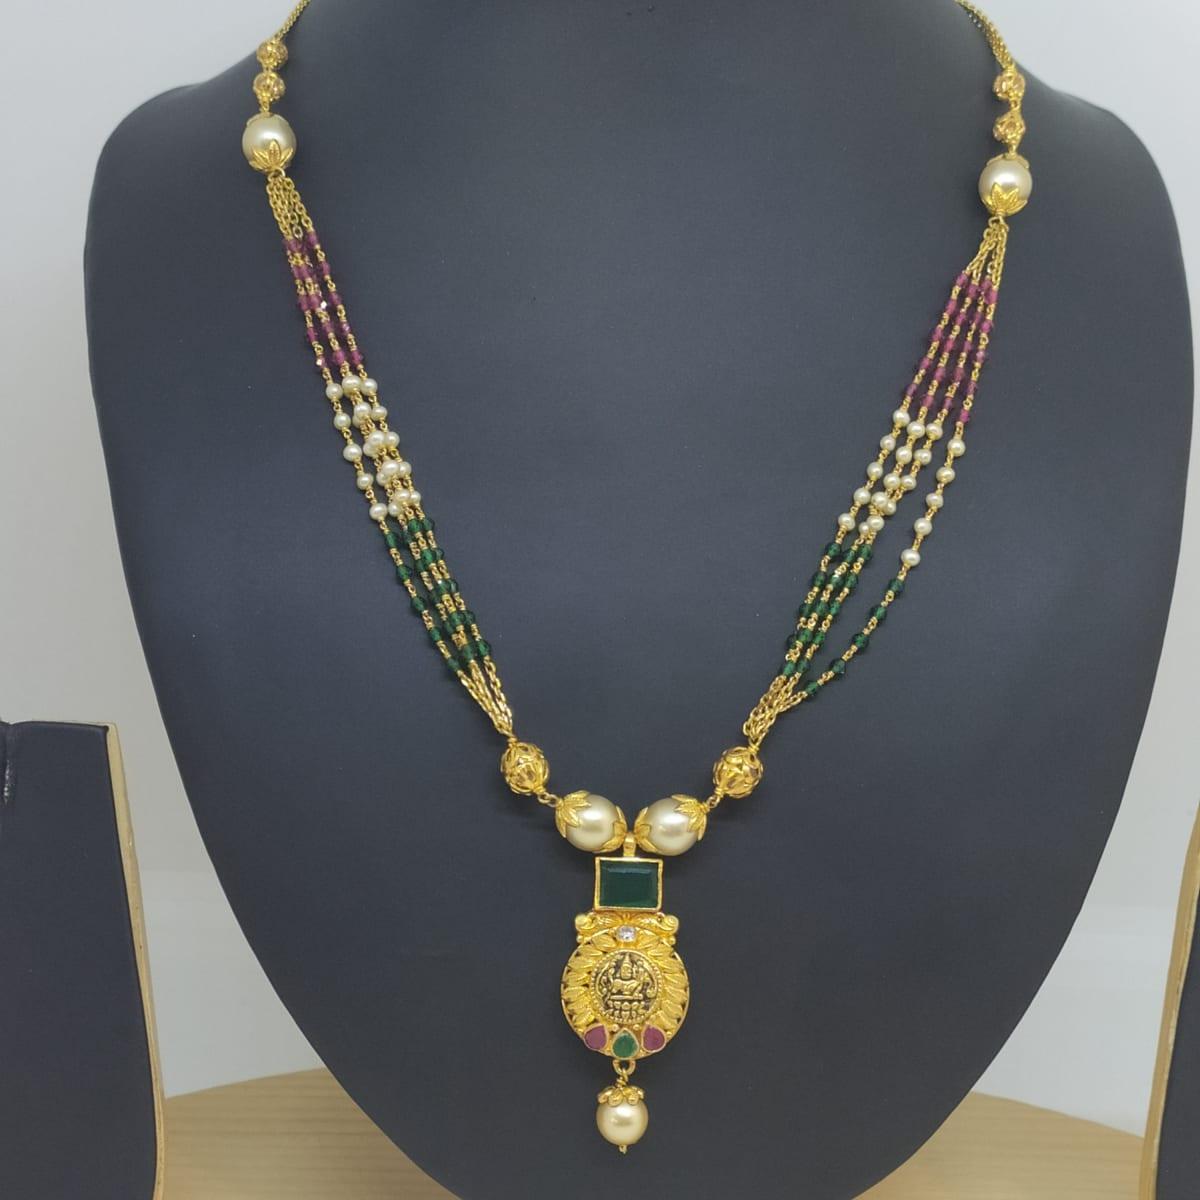 Tricolor Stone With Lakshmi Chain